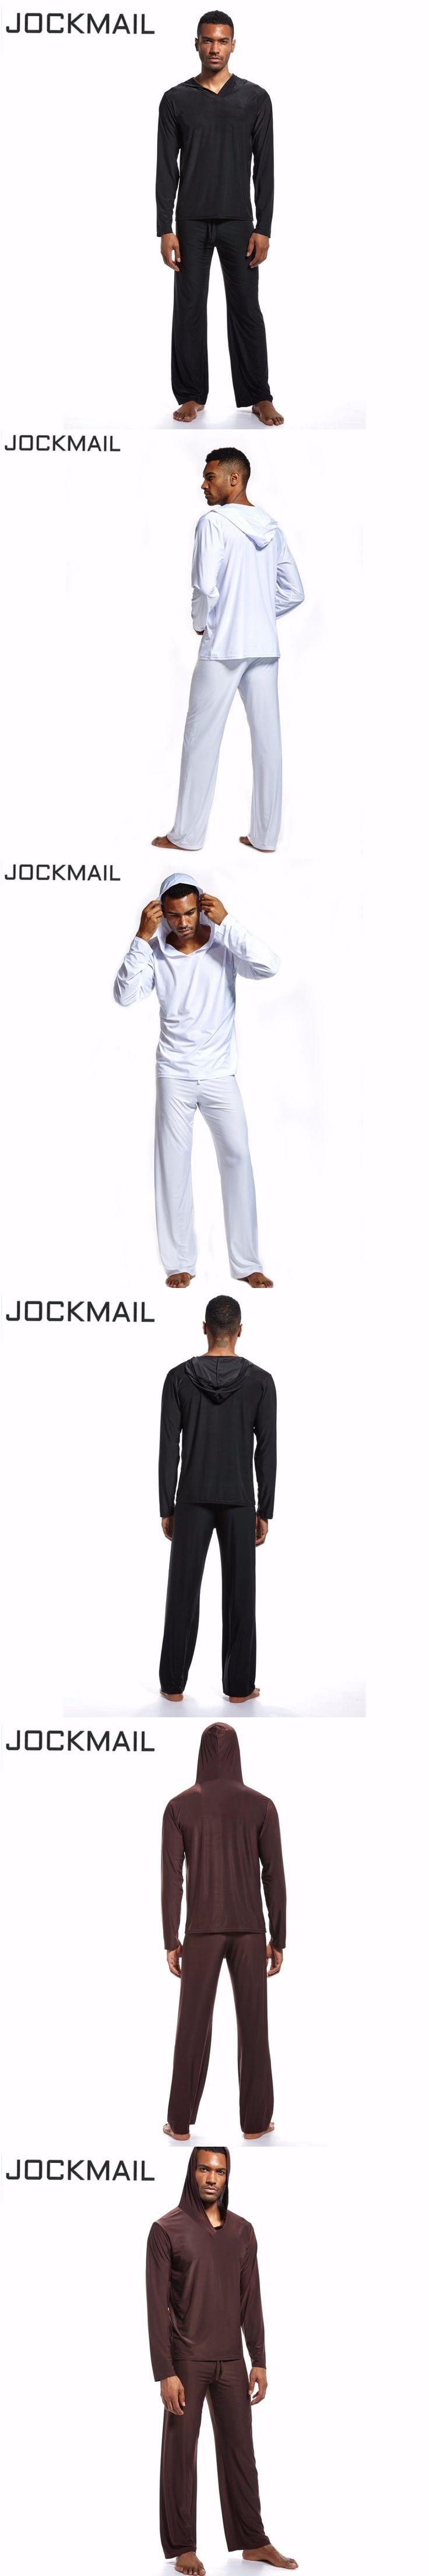 JOCKMAIL Men Activewear Casual Sweatshirt Spandex men's lounge hoodie and Loose trousers long pants For Bodybuilding Fitness